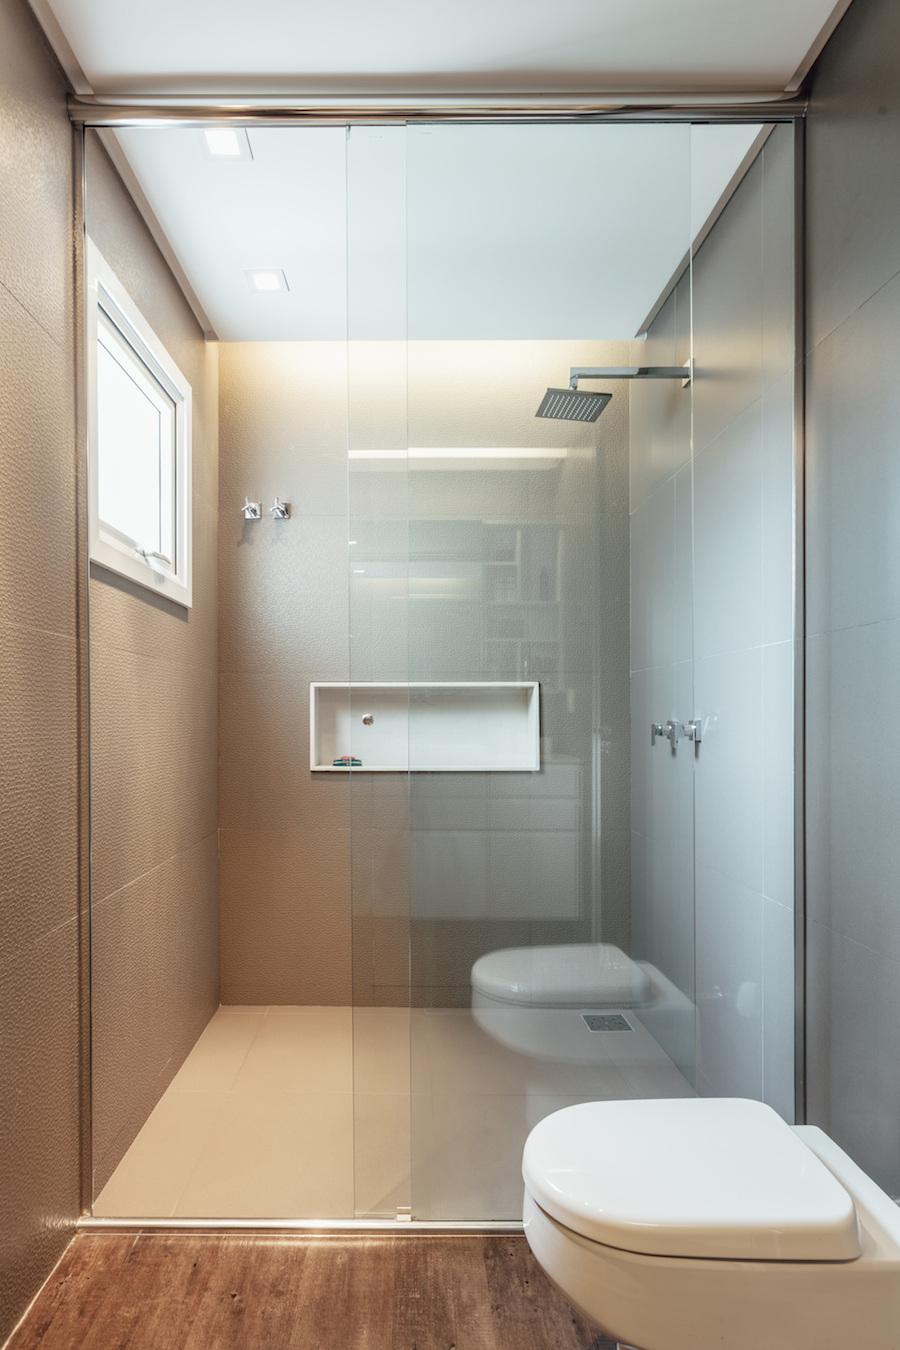 Casa ID House - Cadi Arquitetura23.jpg